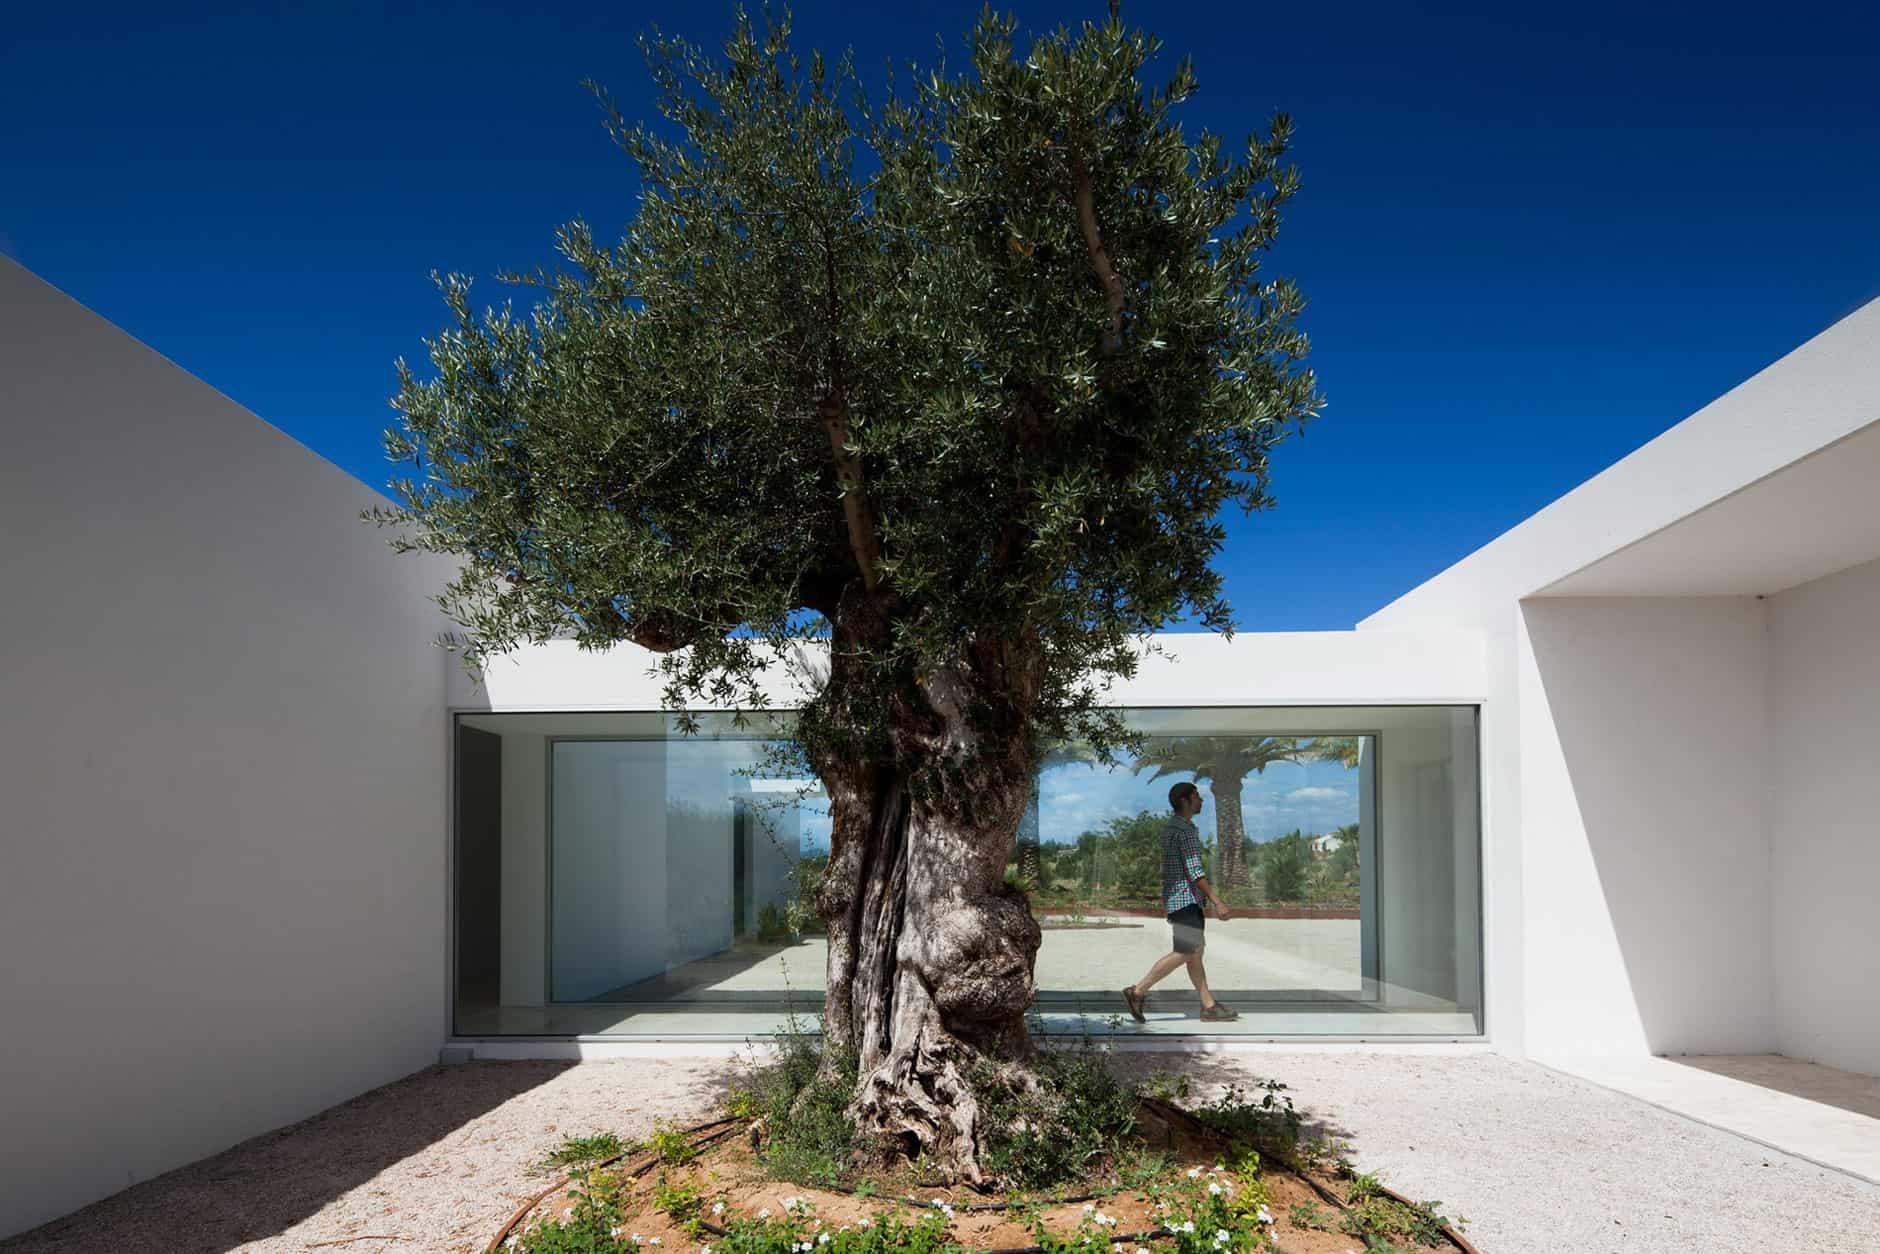 House in Tavira by Vitor Vilhena Architects (5)